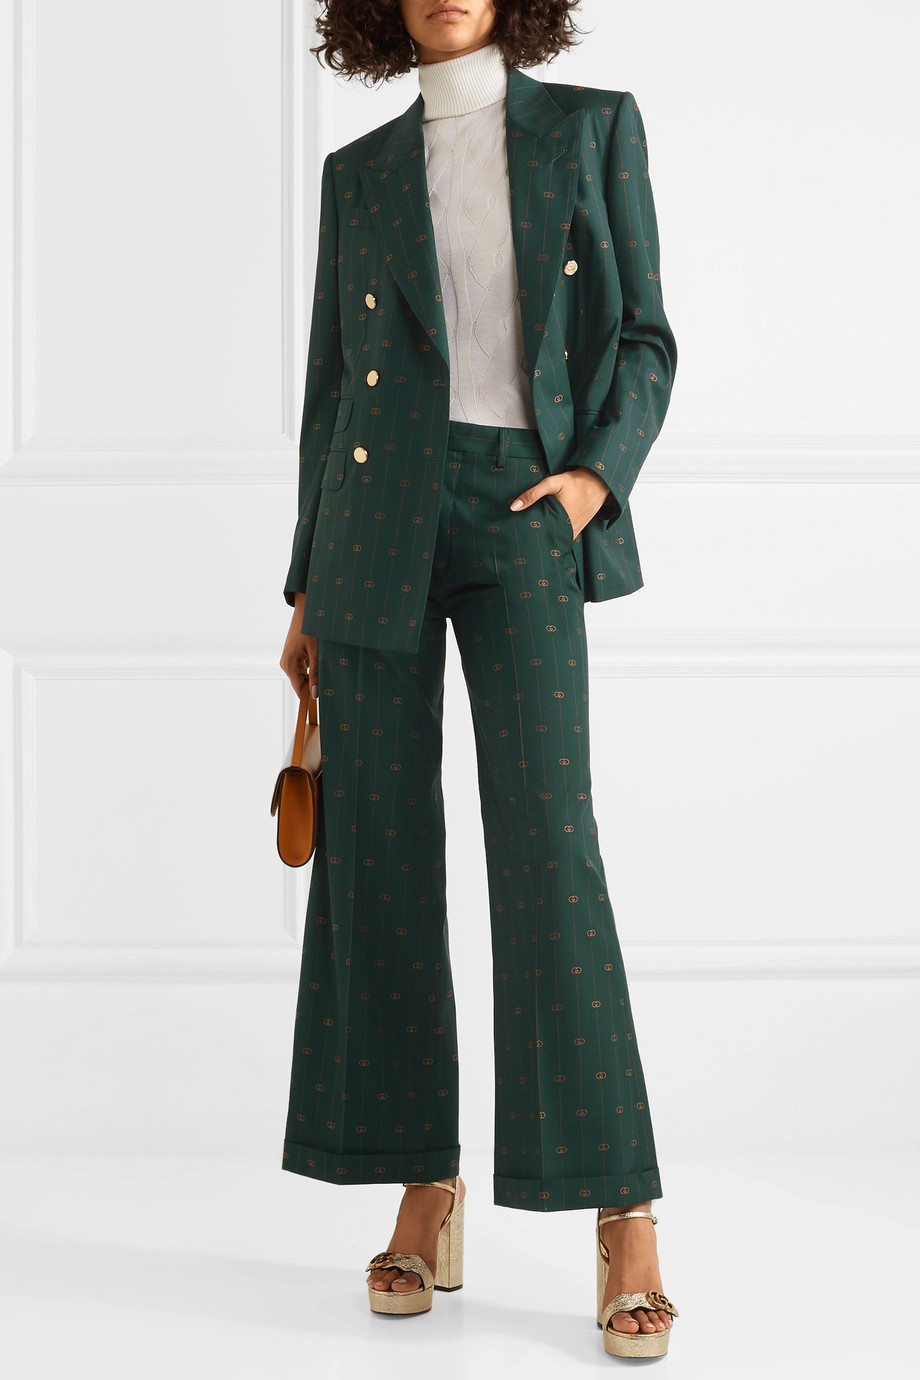 Gucci Pantalon large en laine jacquard